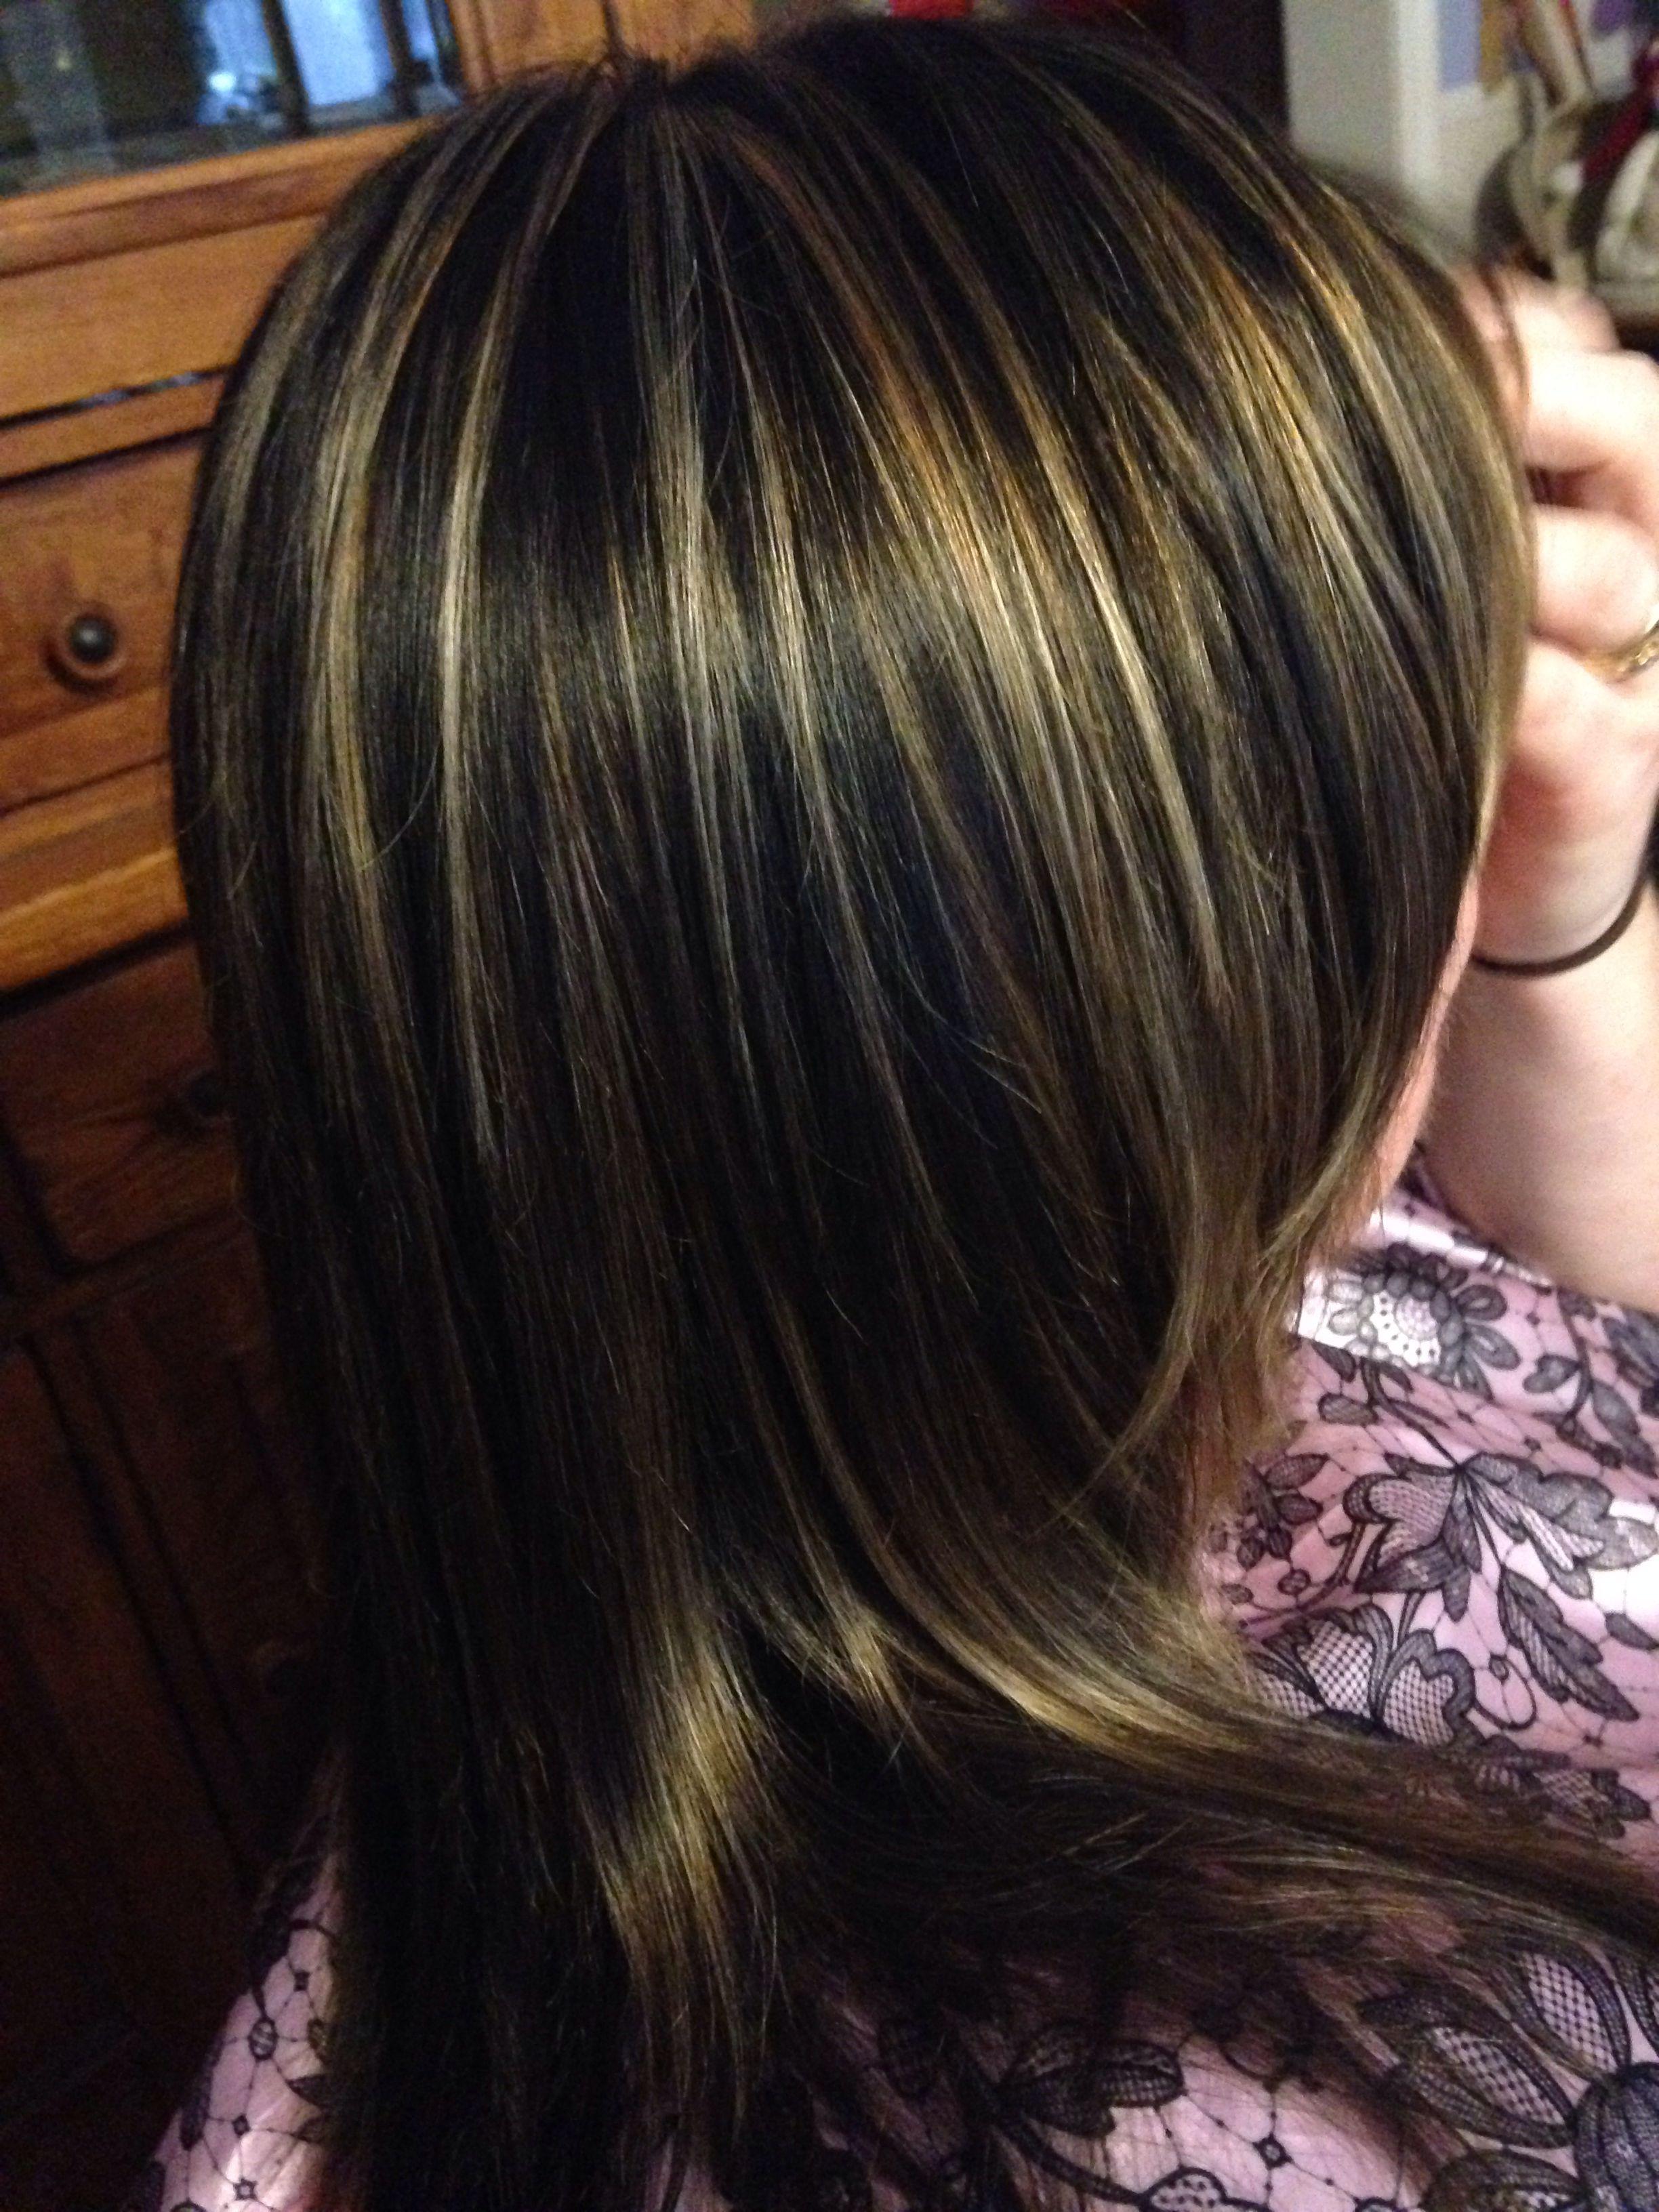 3 Color Hair Foil Dark Brown Medium Brown And Golden